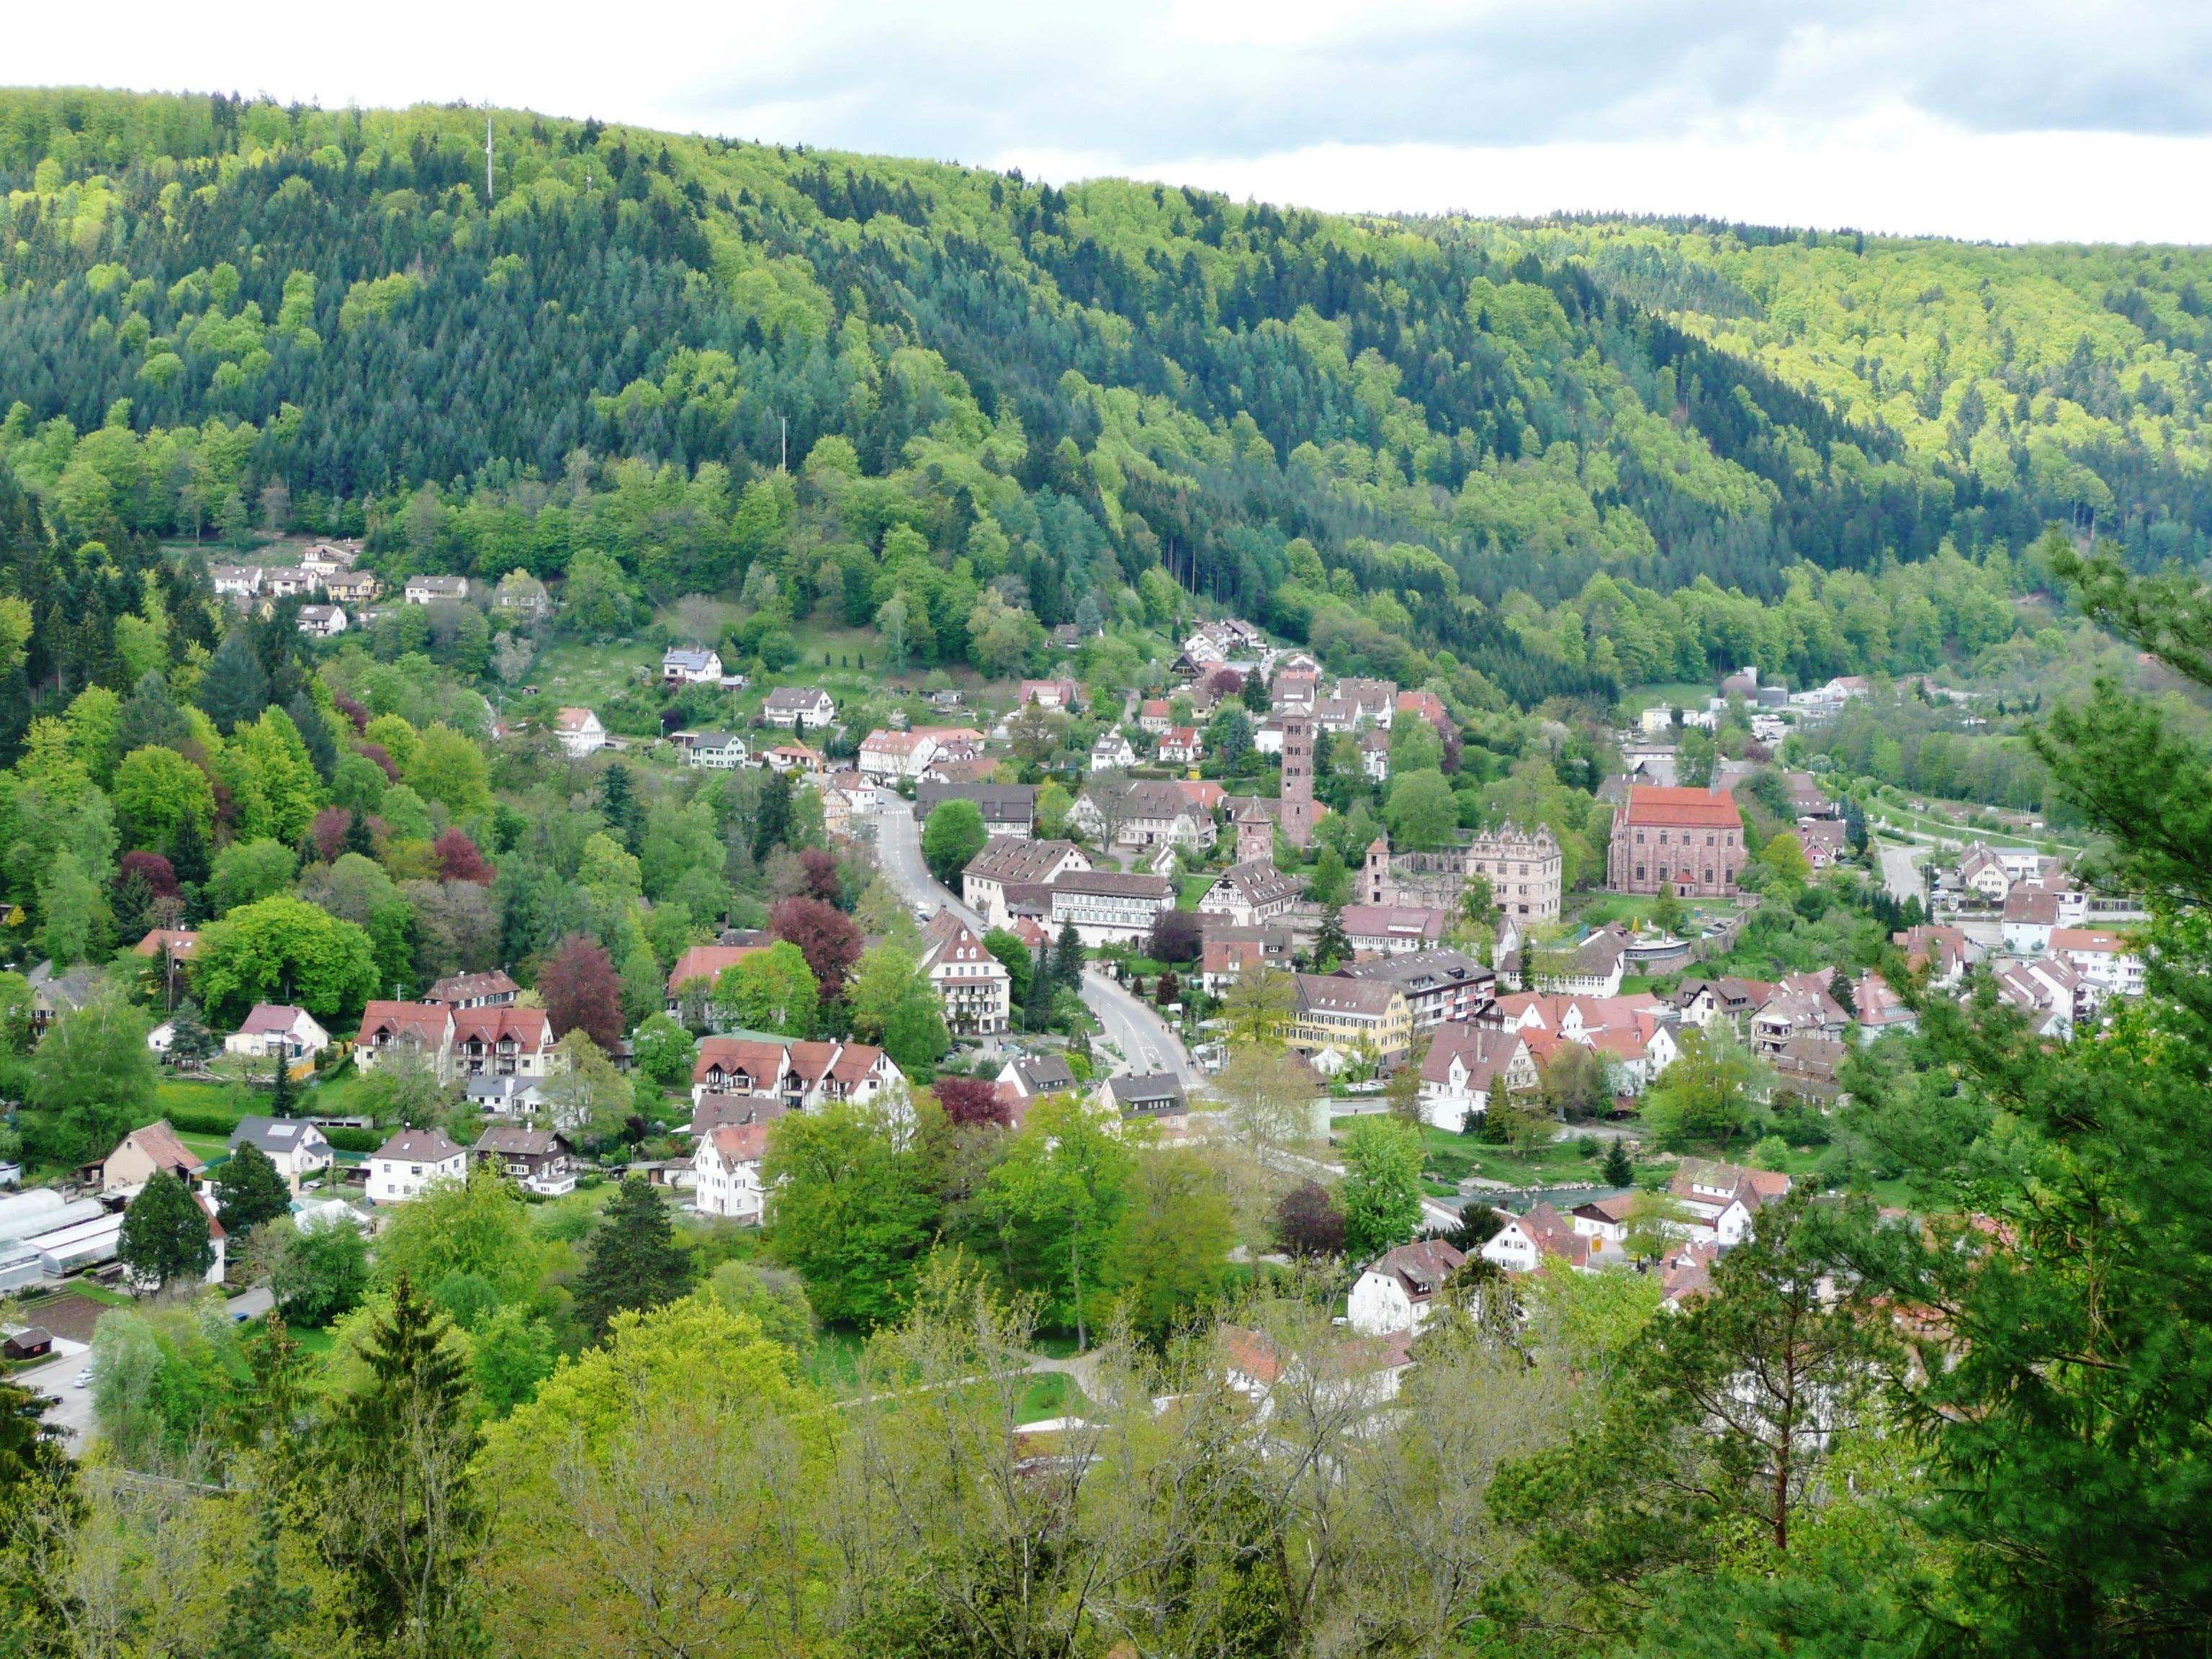 Hirsau, Calw, Baden-Württemberg, Germany